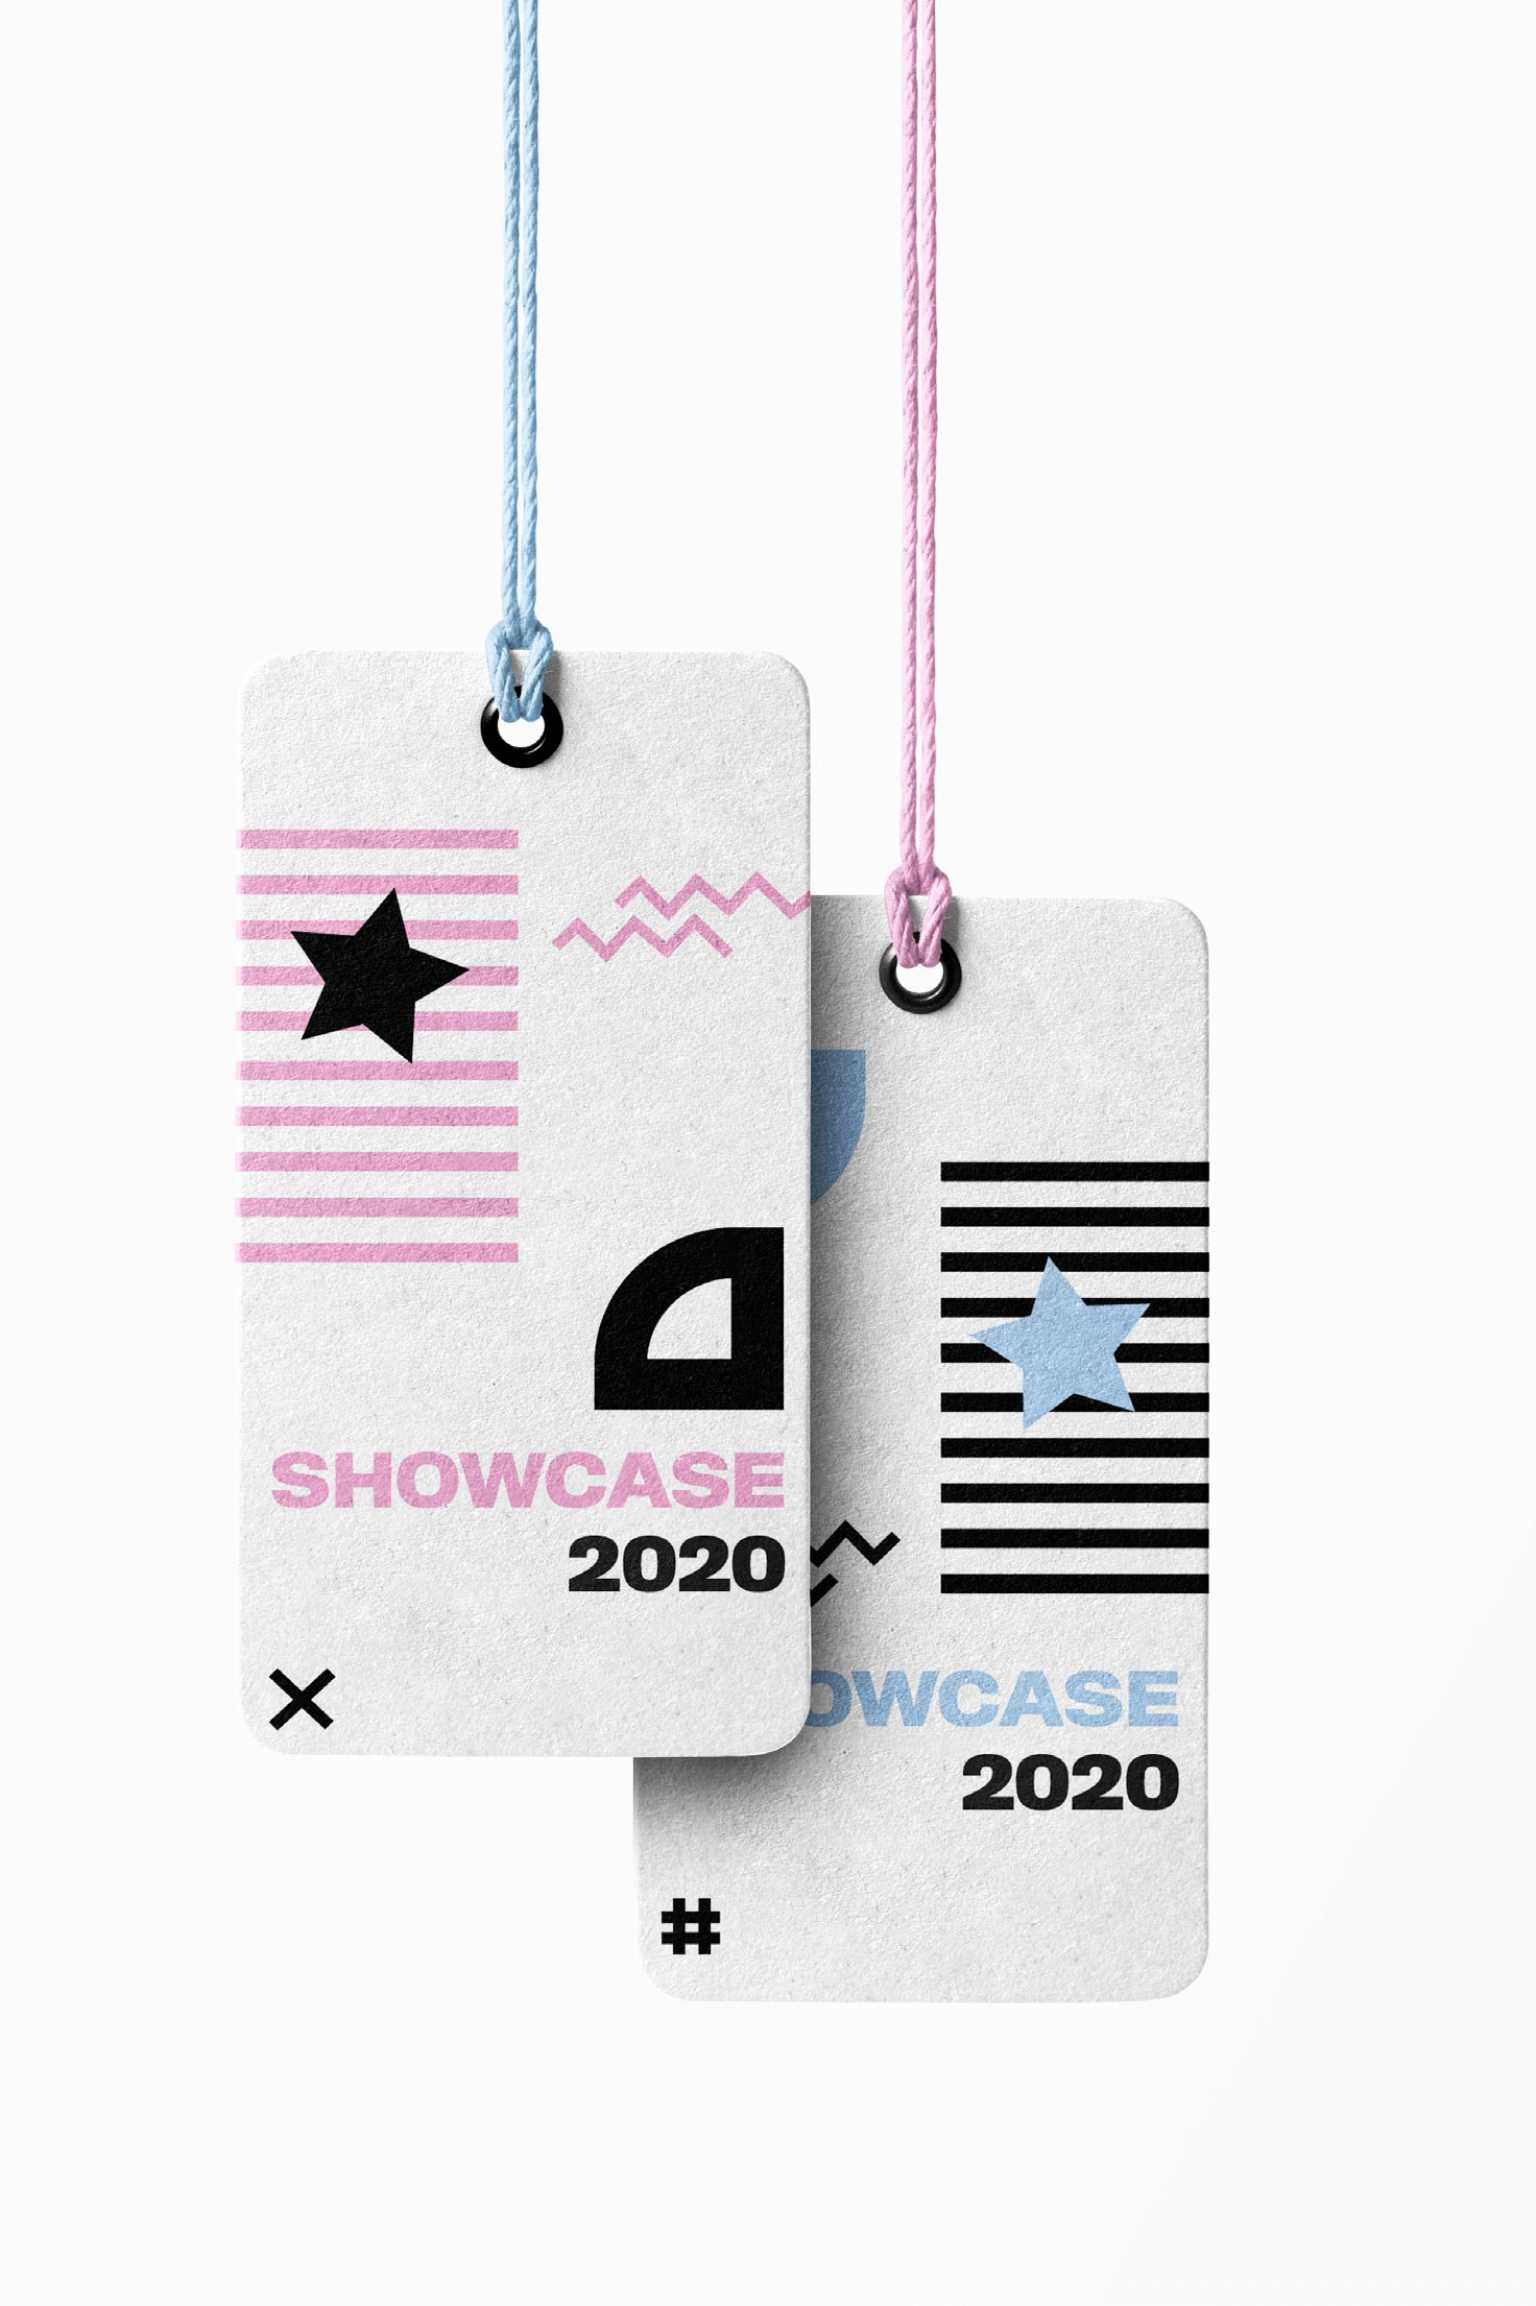 Showcase 2020 Clothing Tags